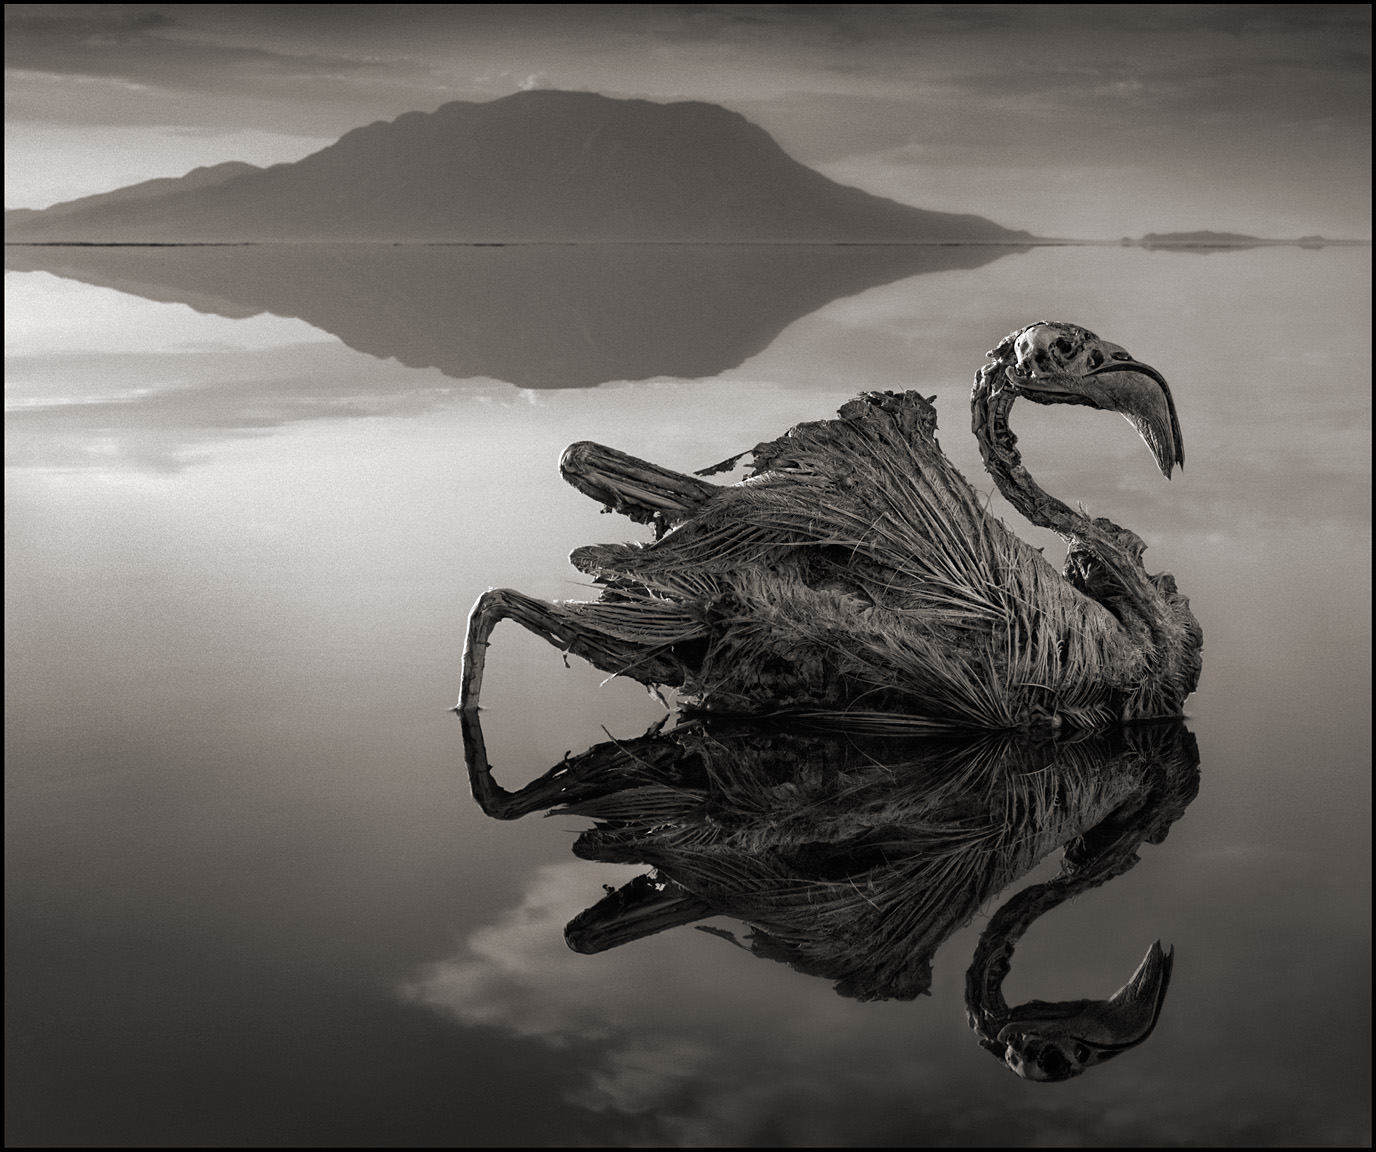 Nick Brandt – Tanzania lake